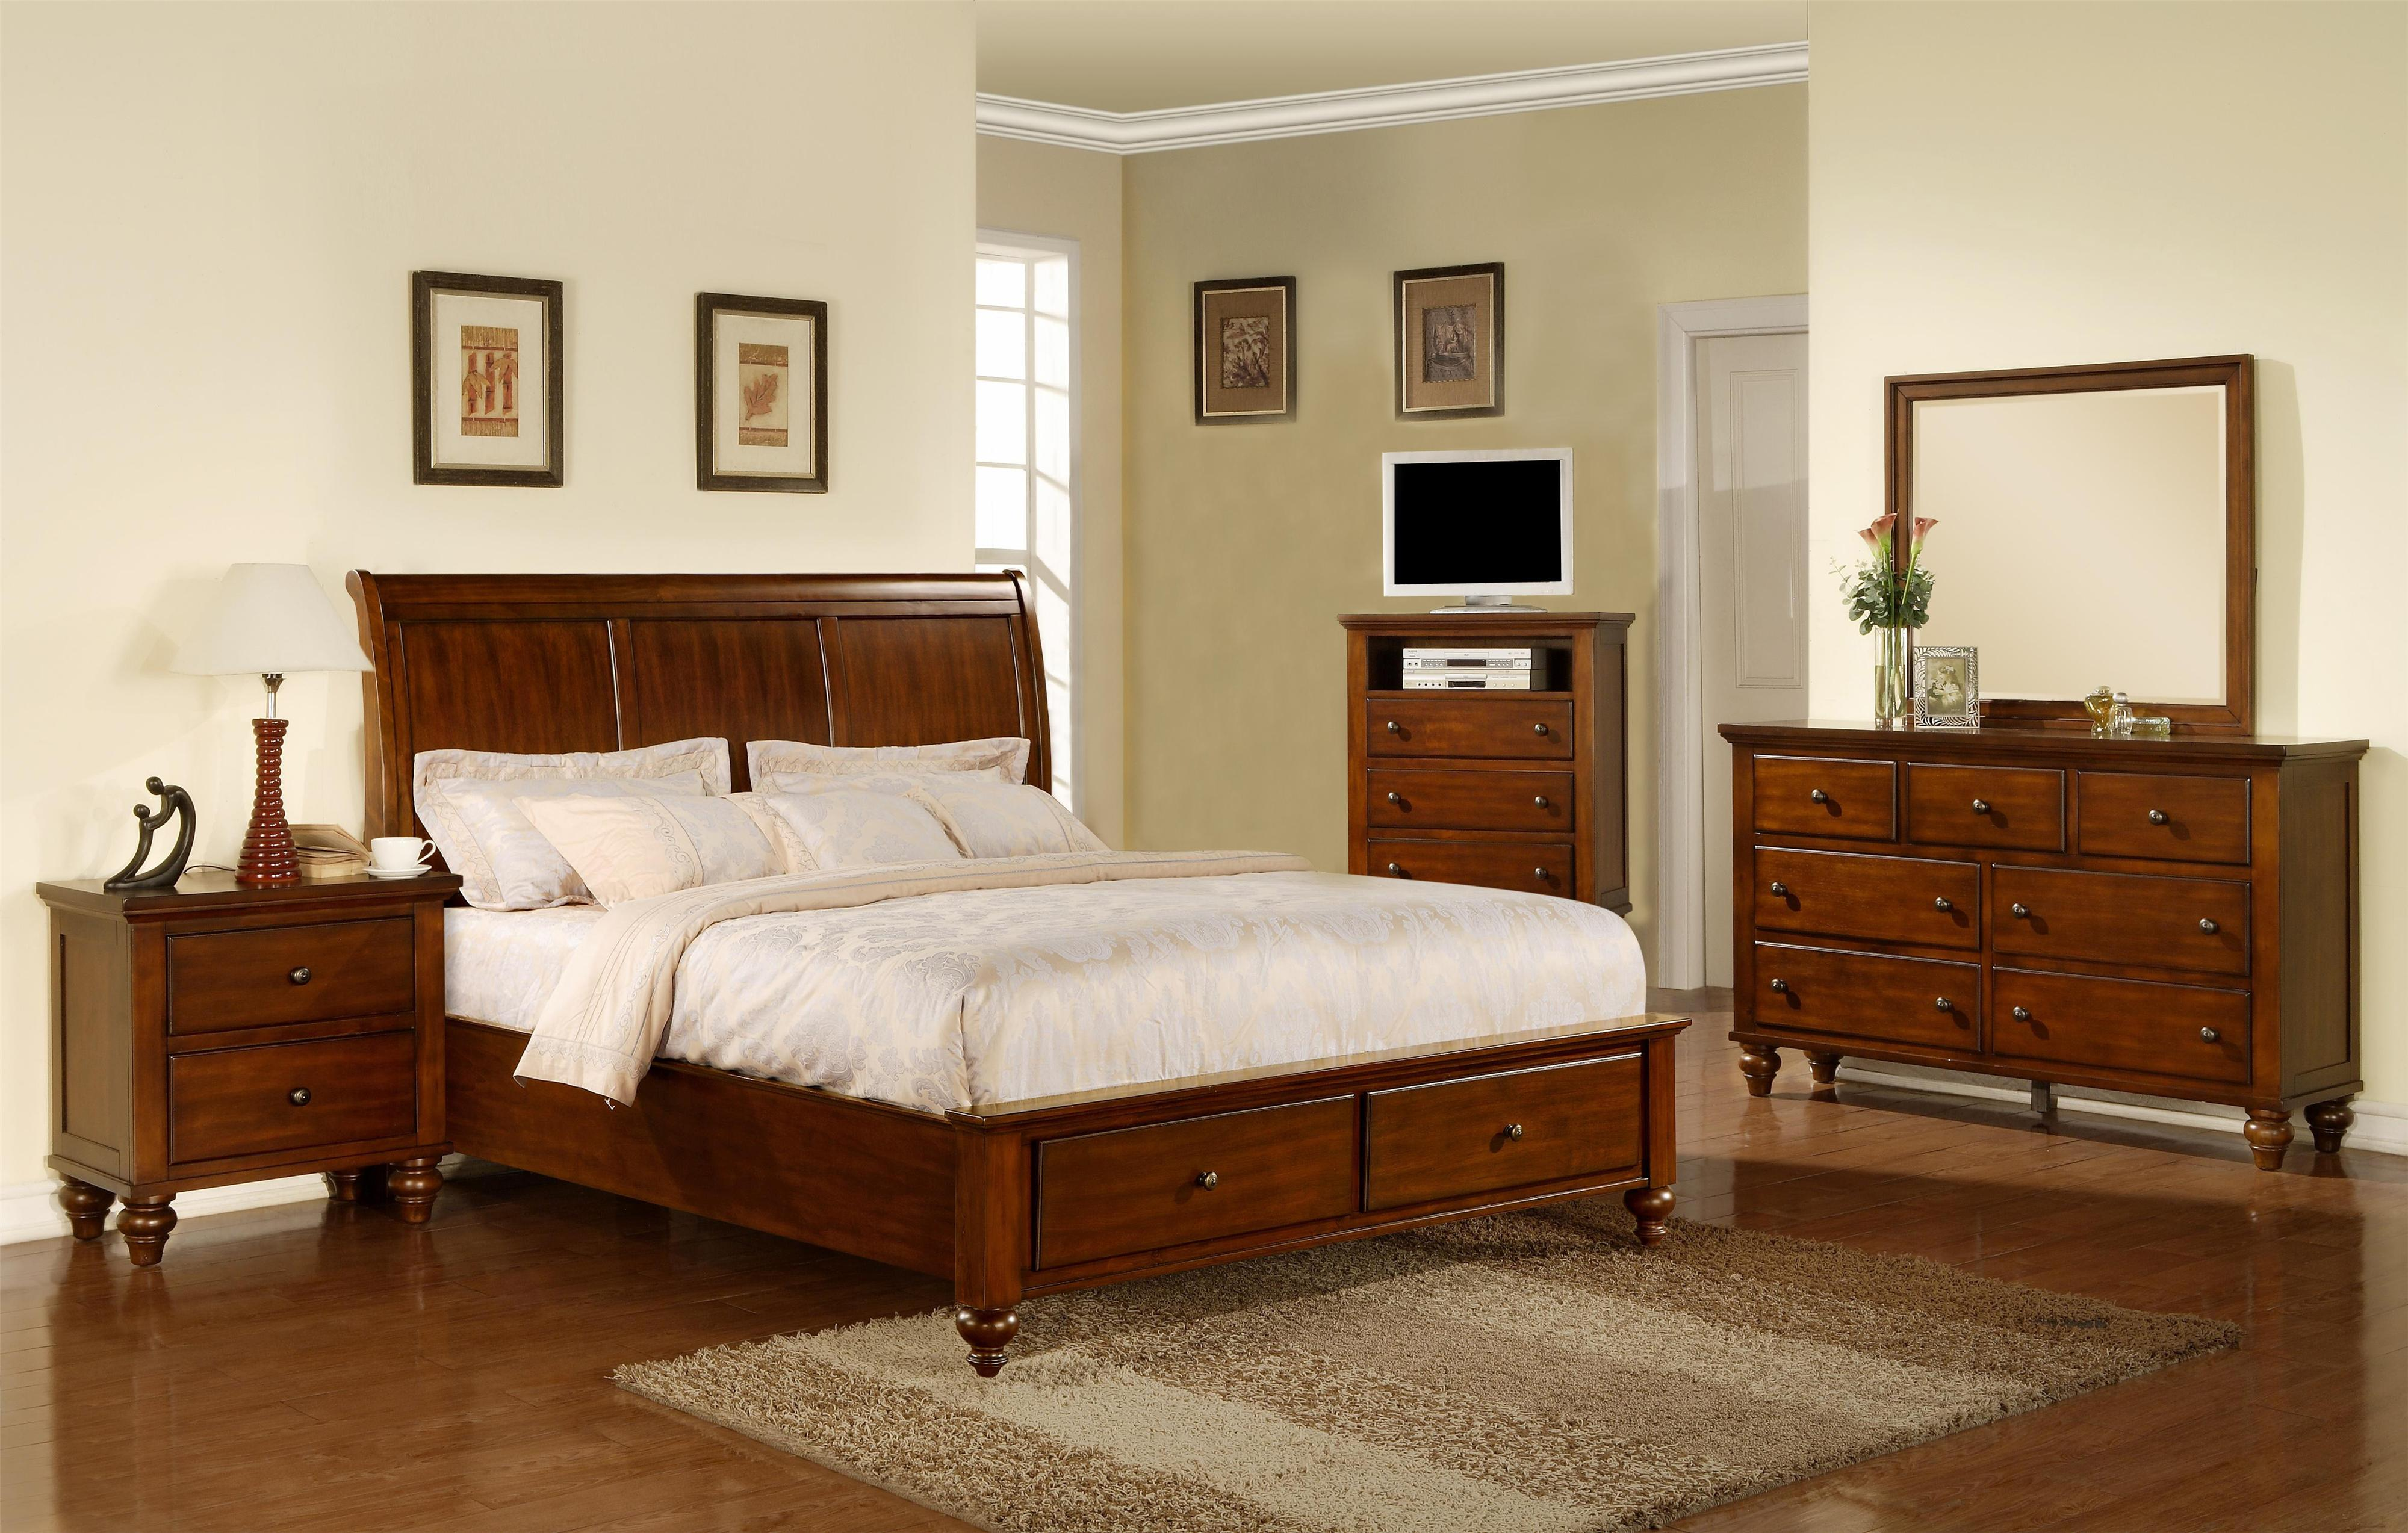 5 Piece King Bedroom Group